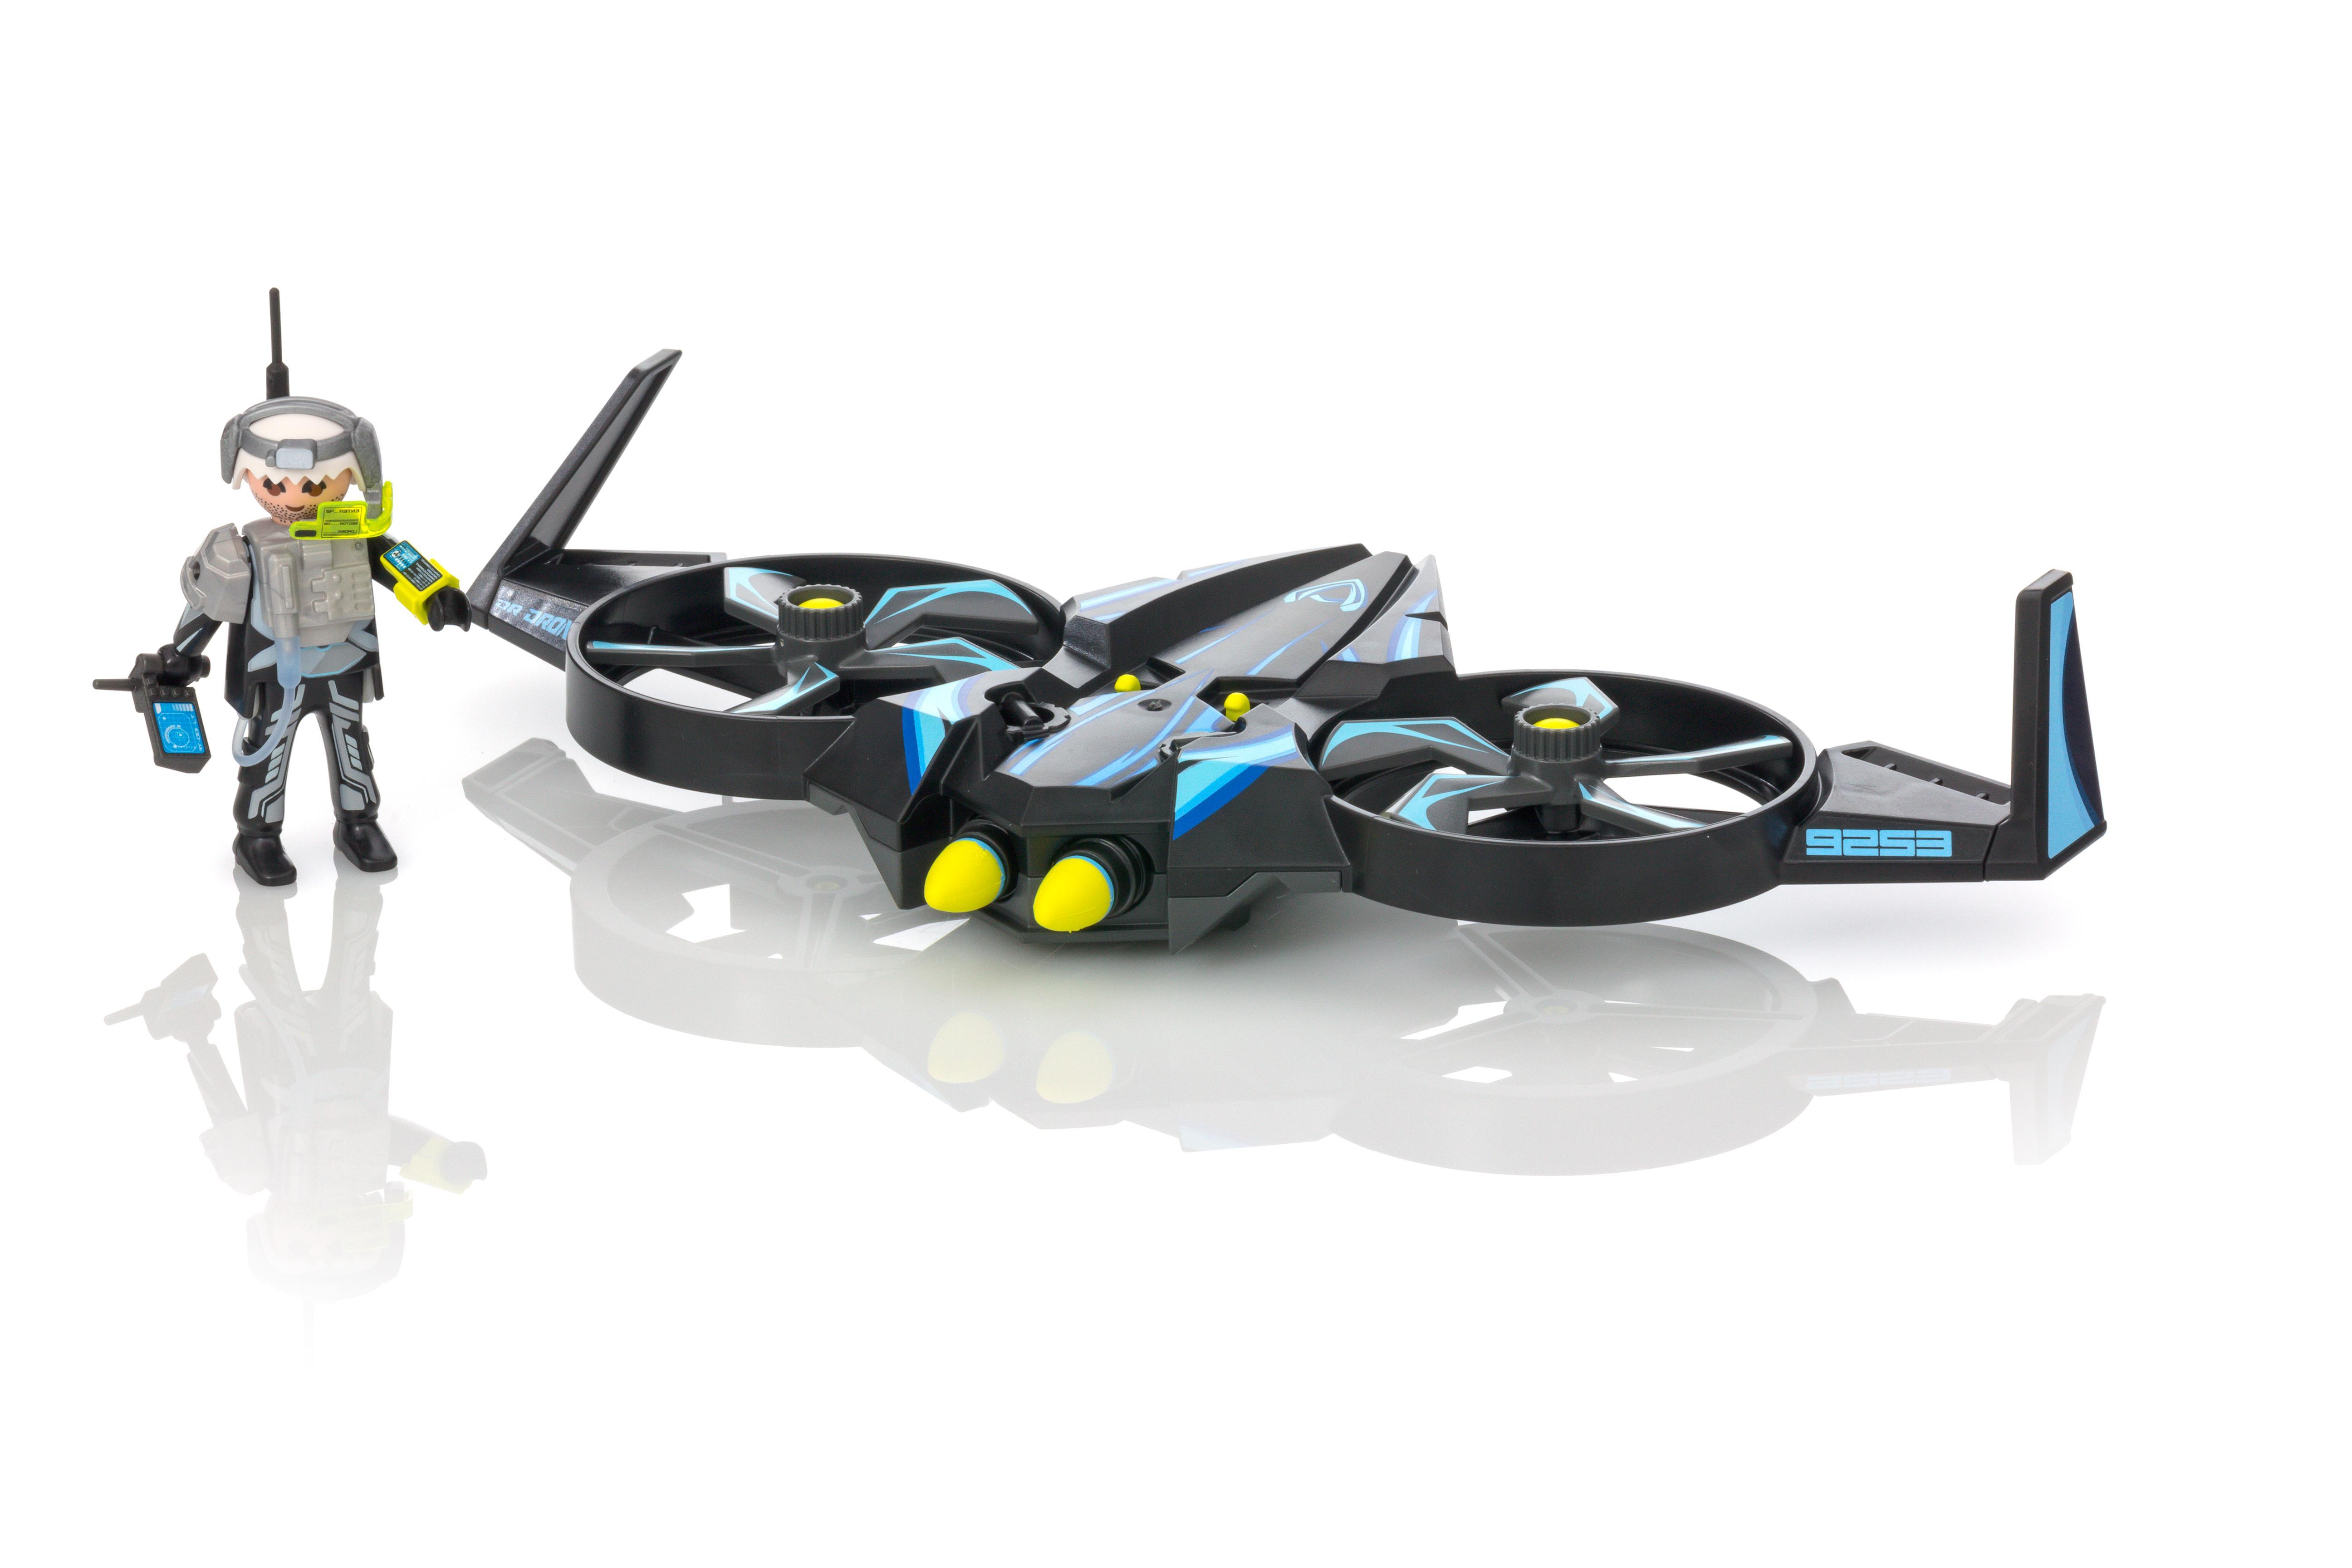 dronex pro jakarta